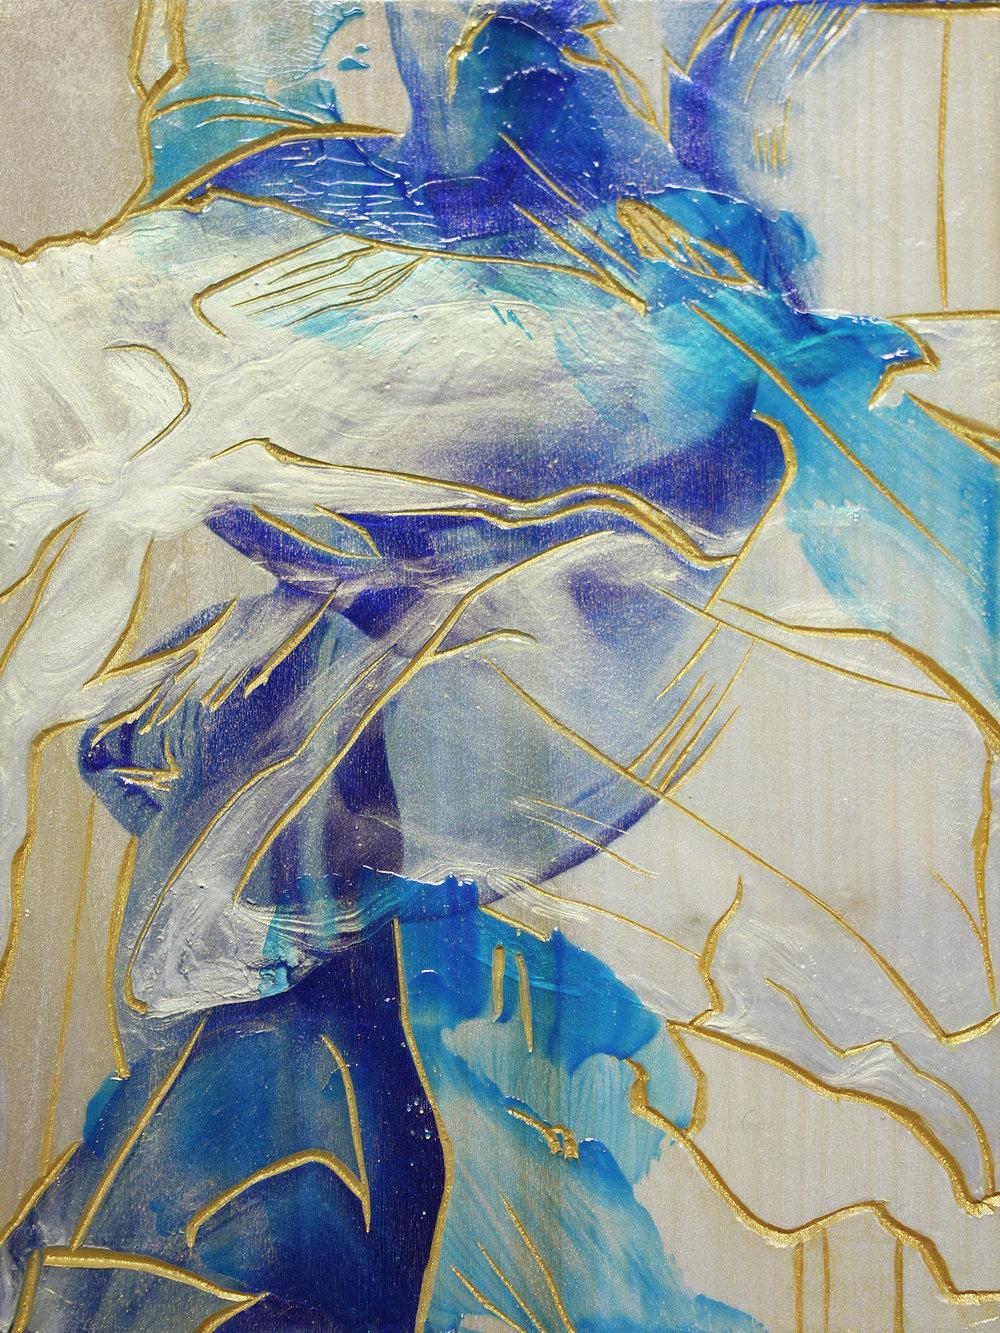 Pillar , 2015, acrylic on Japanese Magnolia, 20x15cm. (acquired)